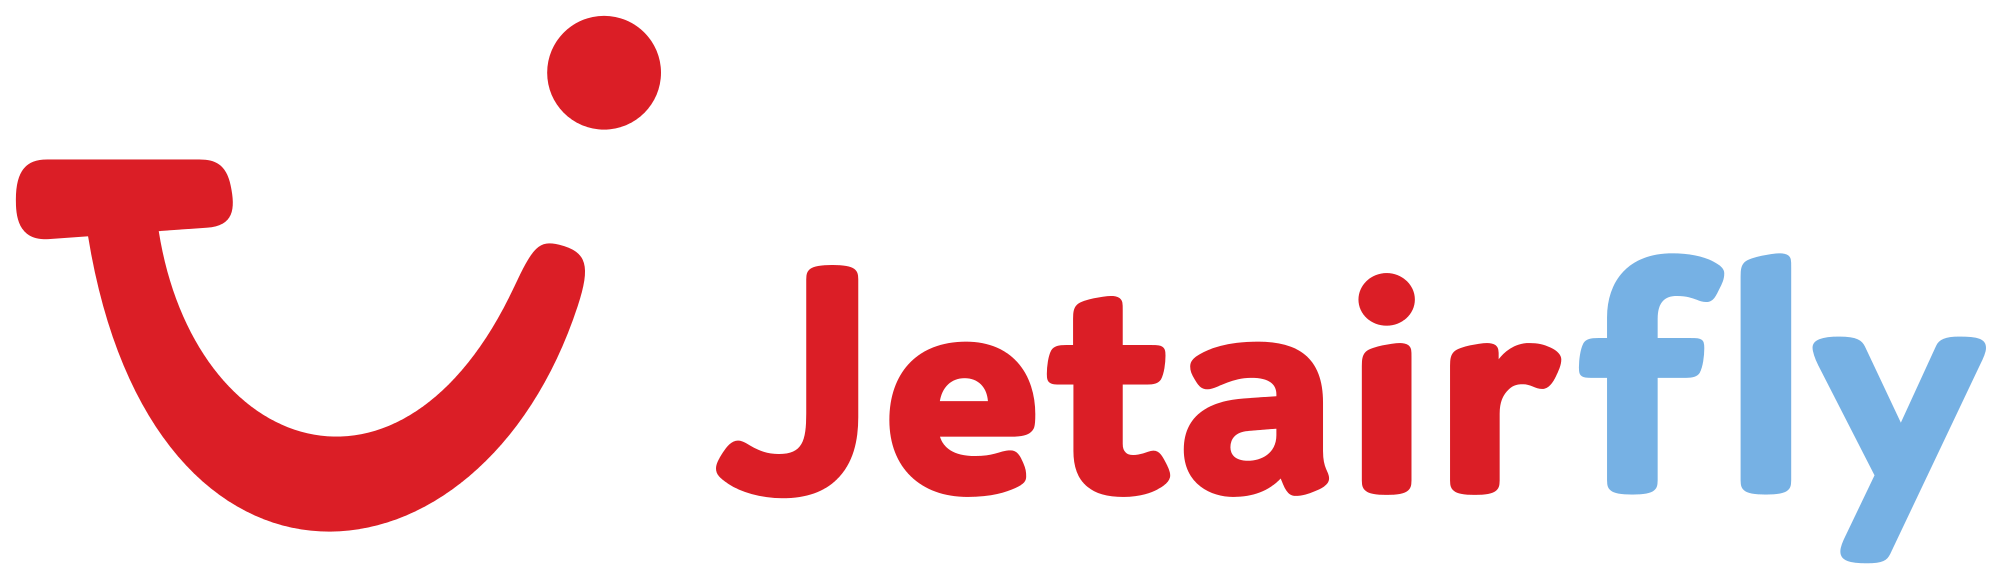 Télephone information entreprise  Jetairfly